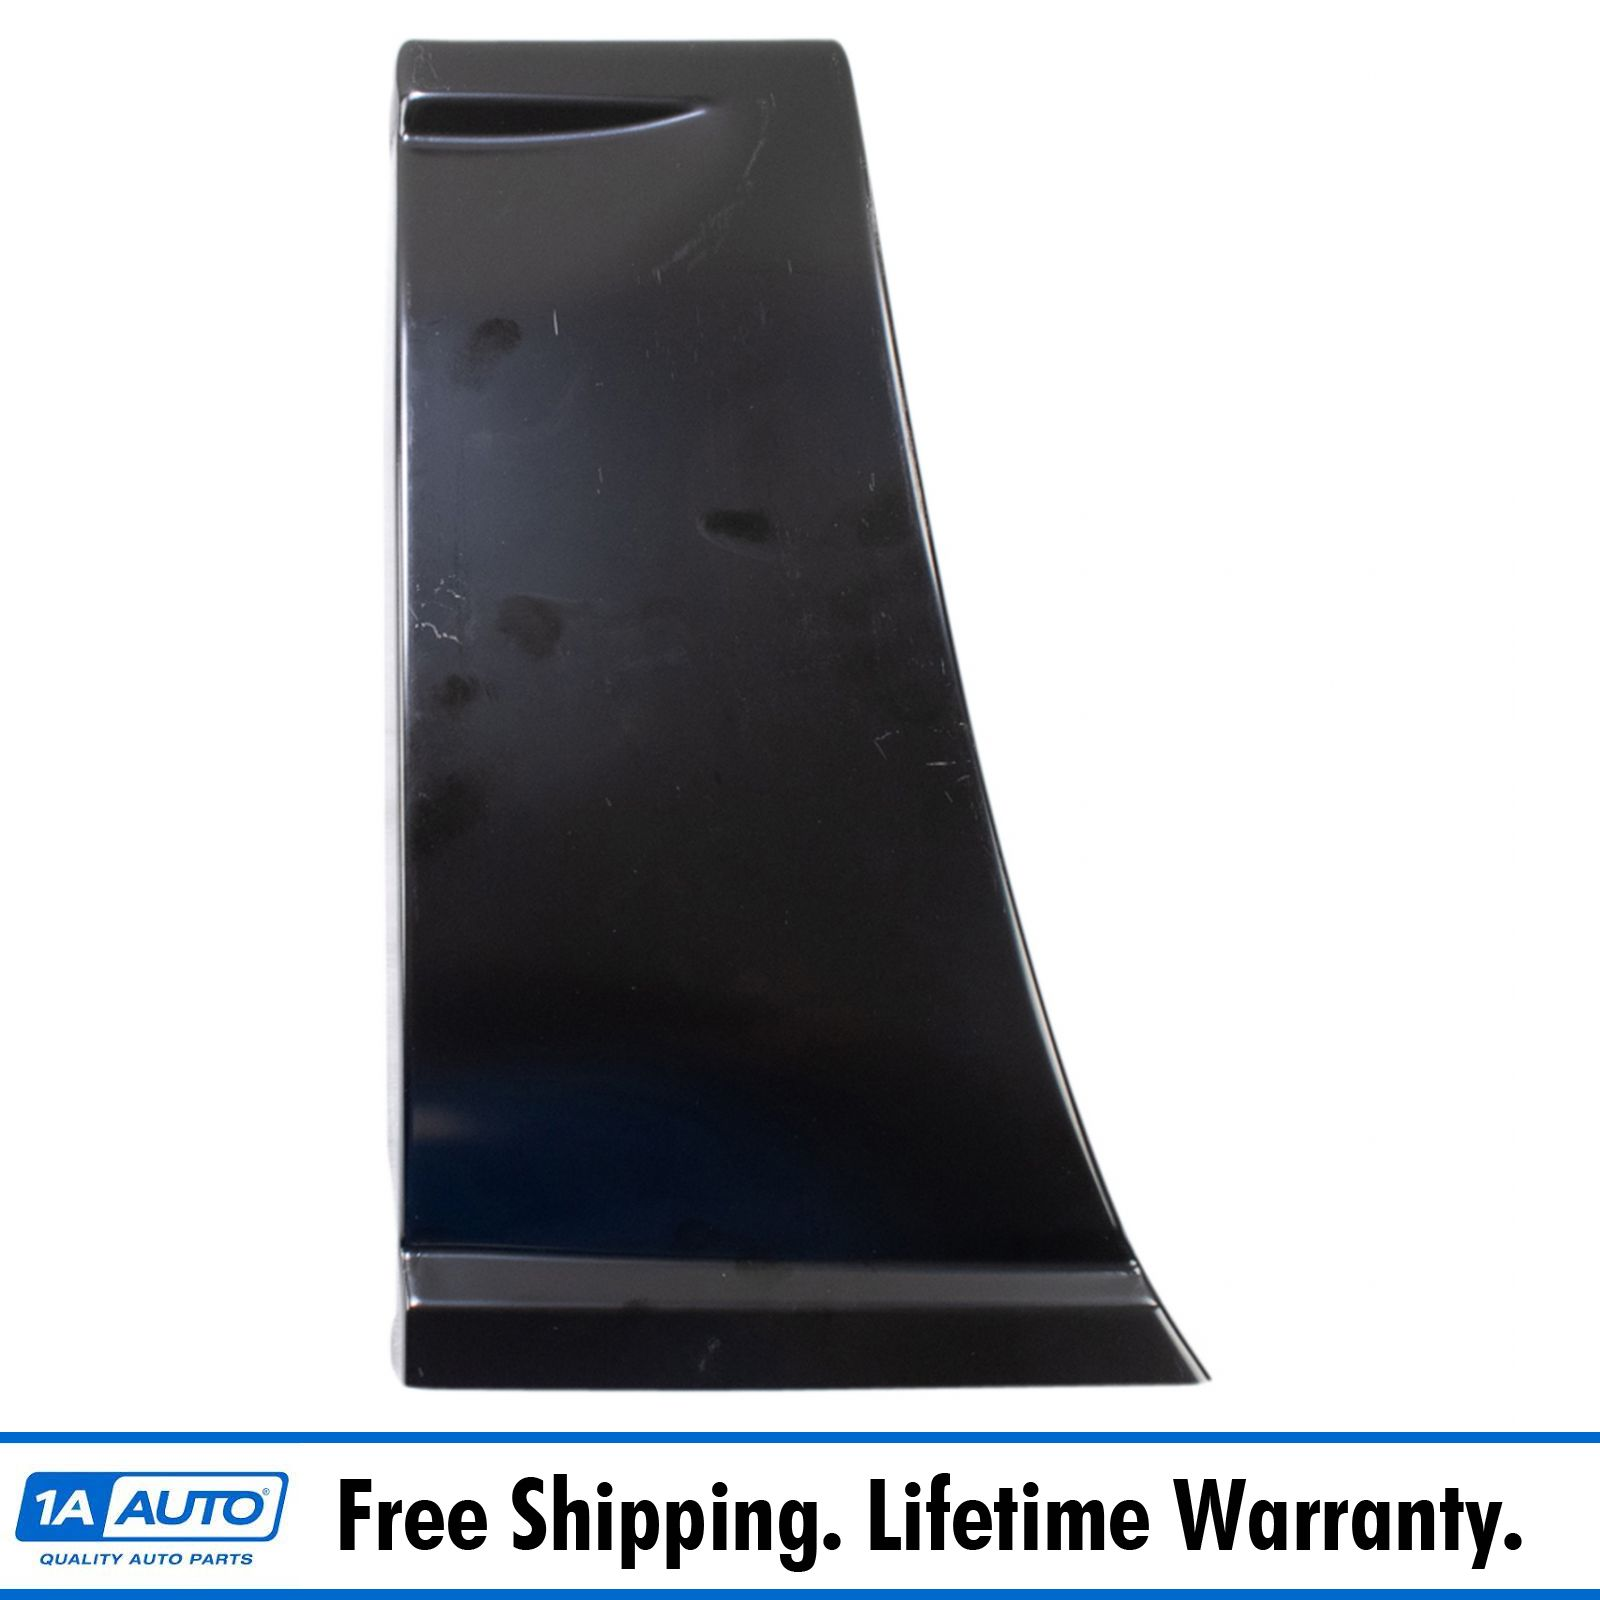 hight resolution of quarter repair panel front lower passenger side for suburban yukon xl avalanche